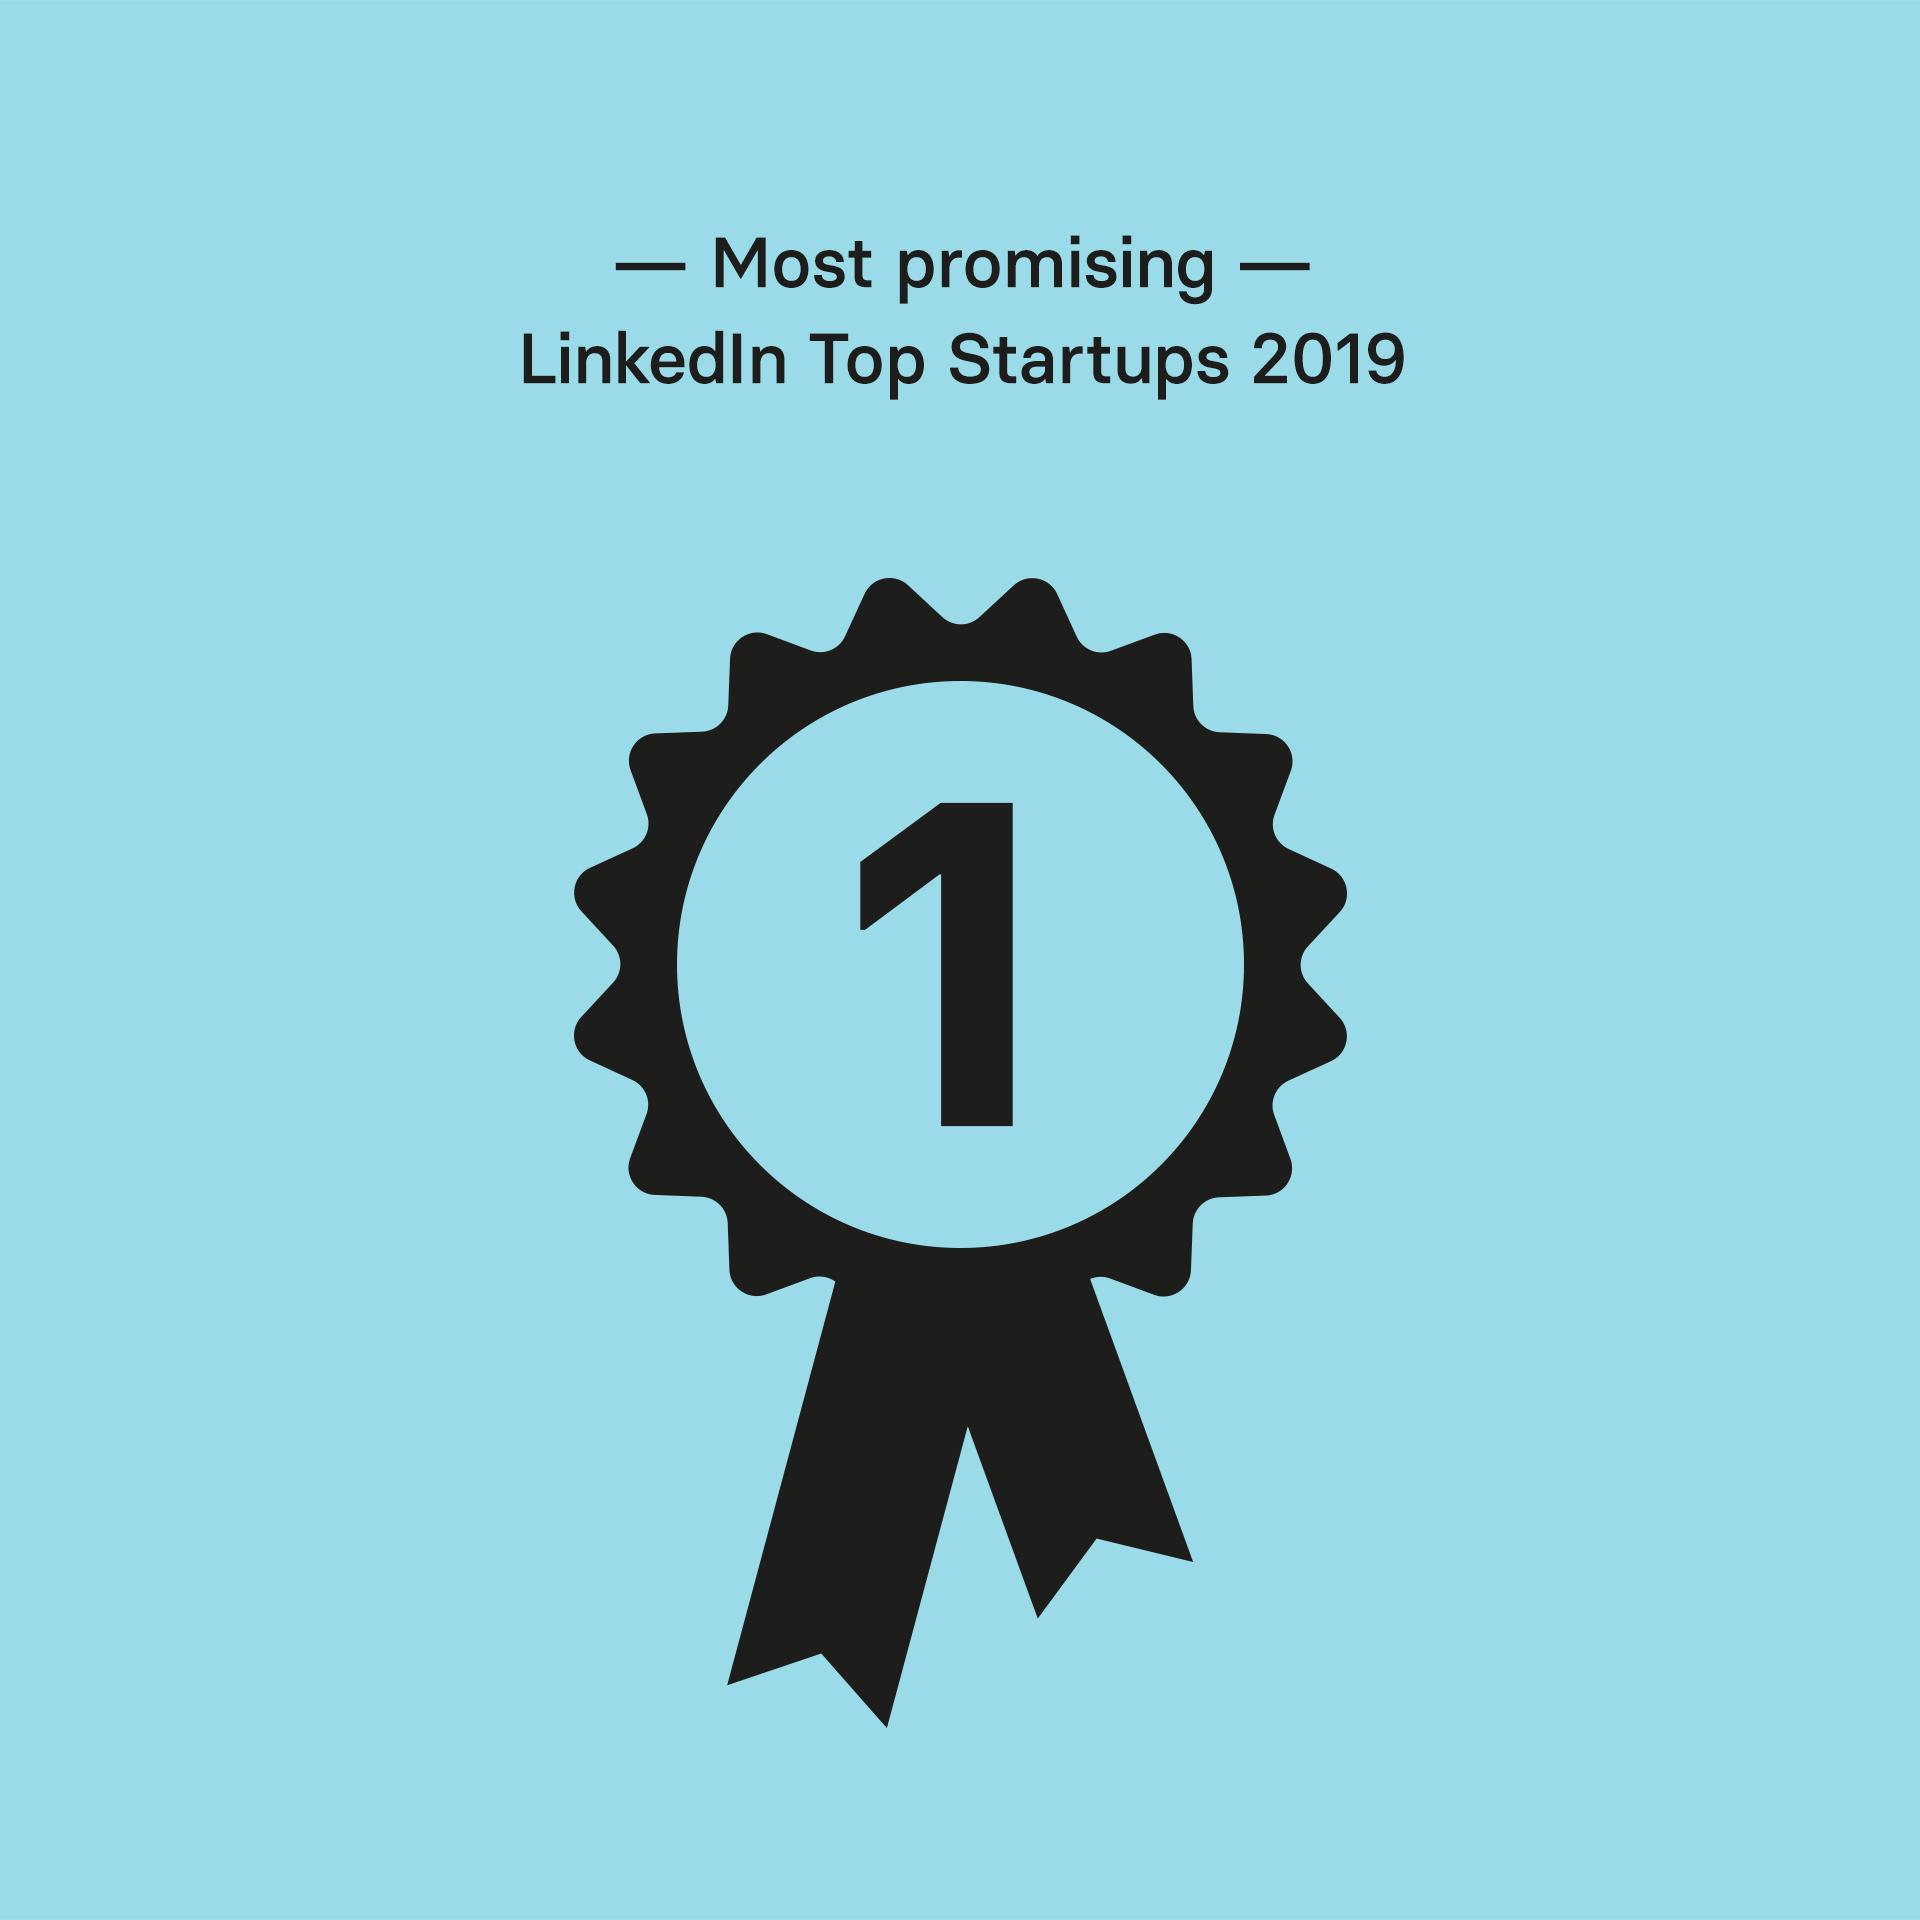 Lightyear Top LinkedIn Dutch Start-up 2019